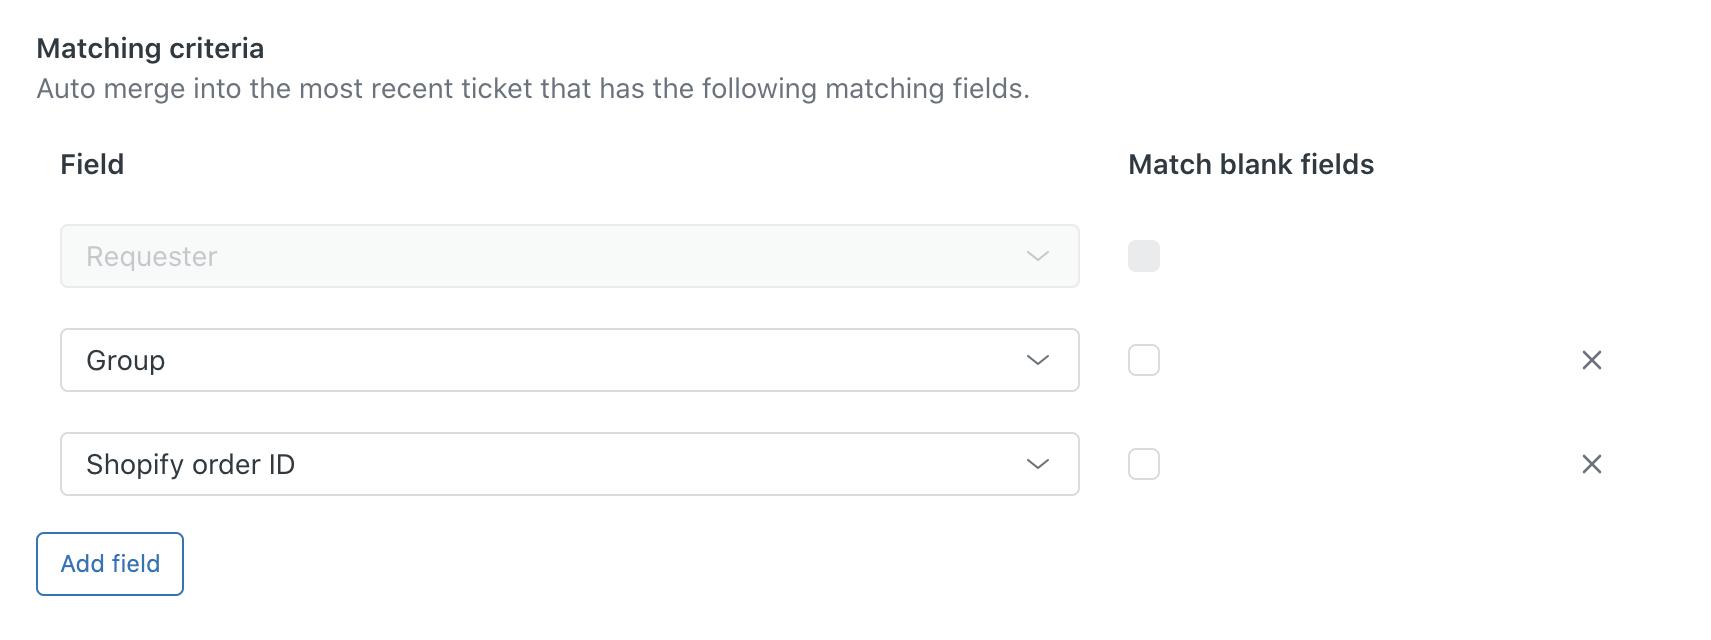 matching_criteria.png